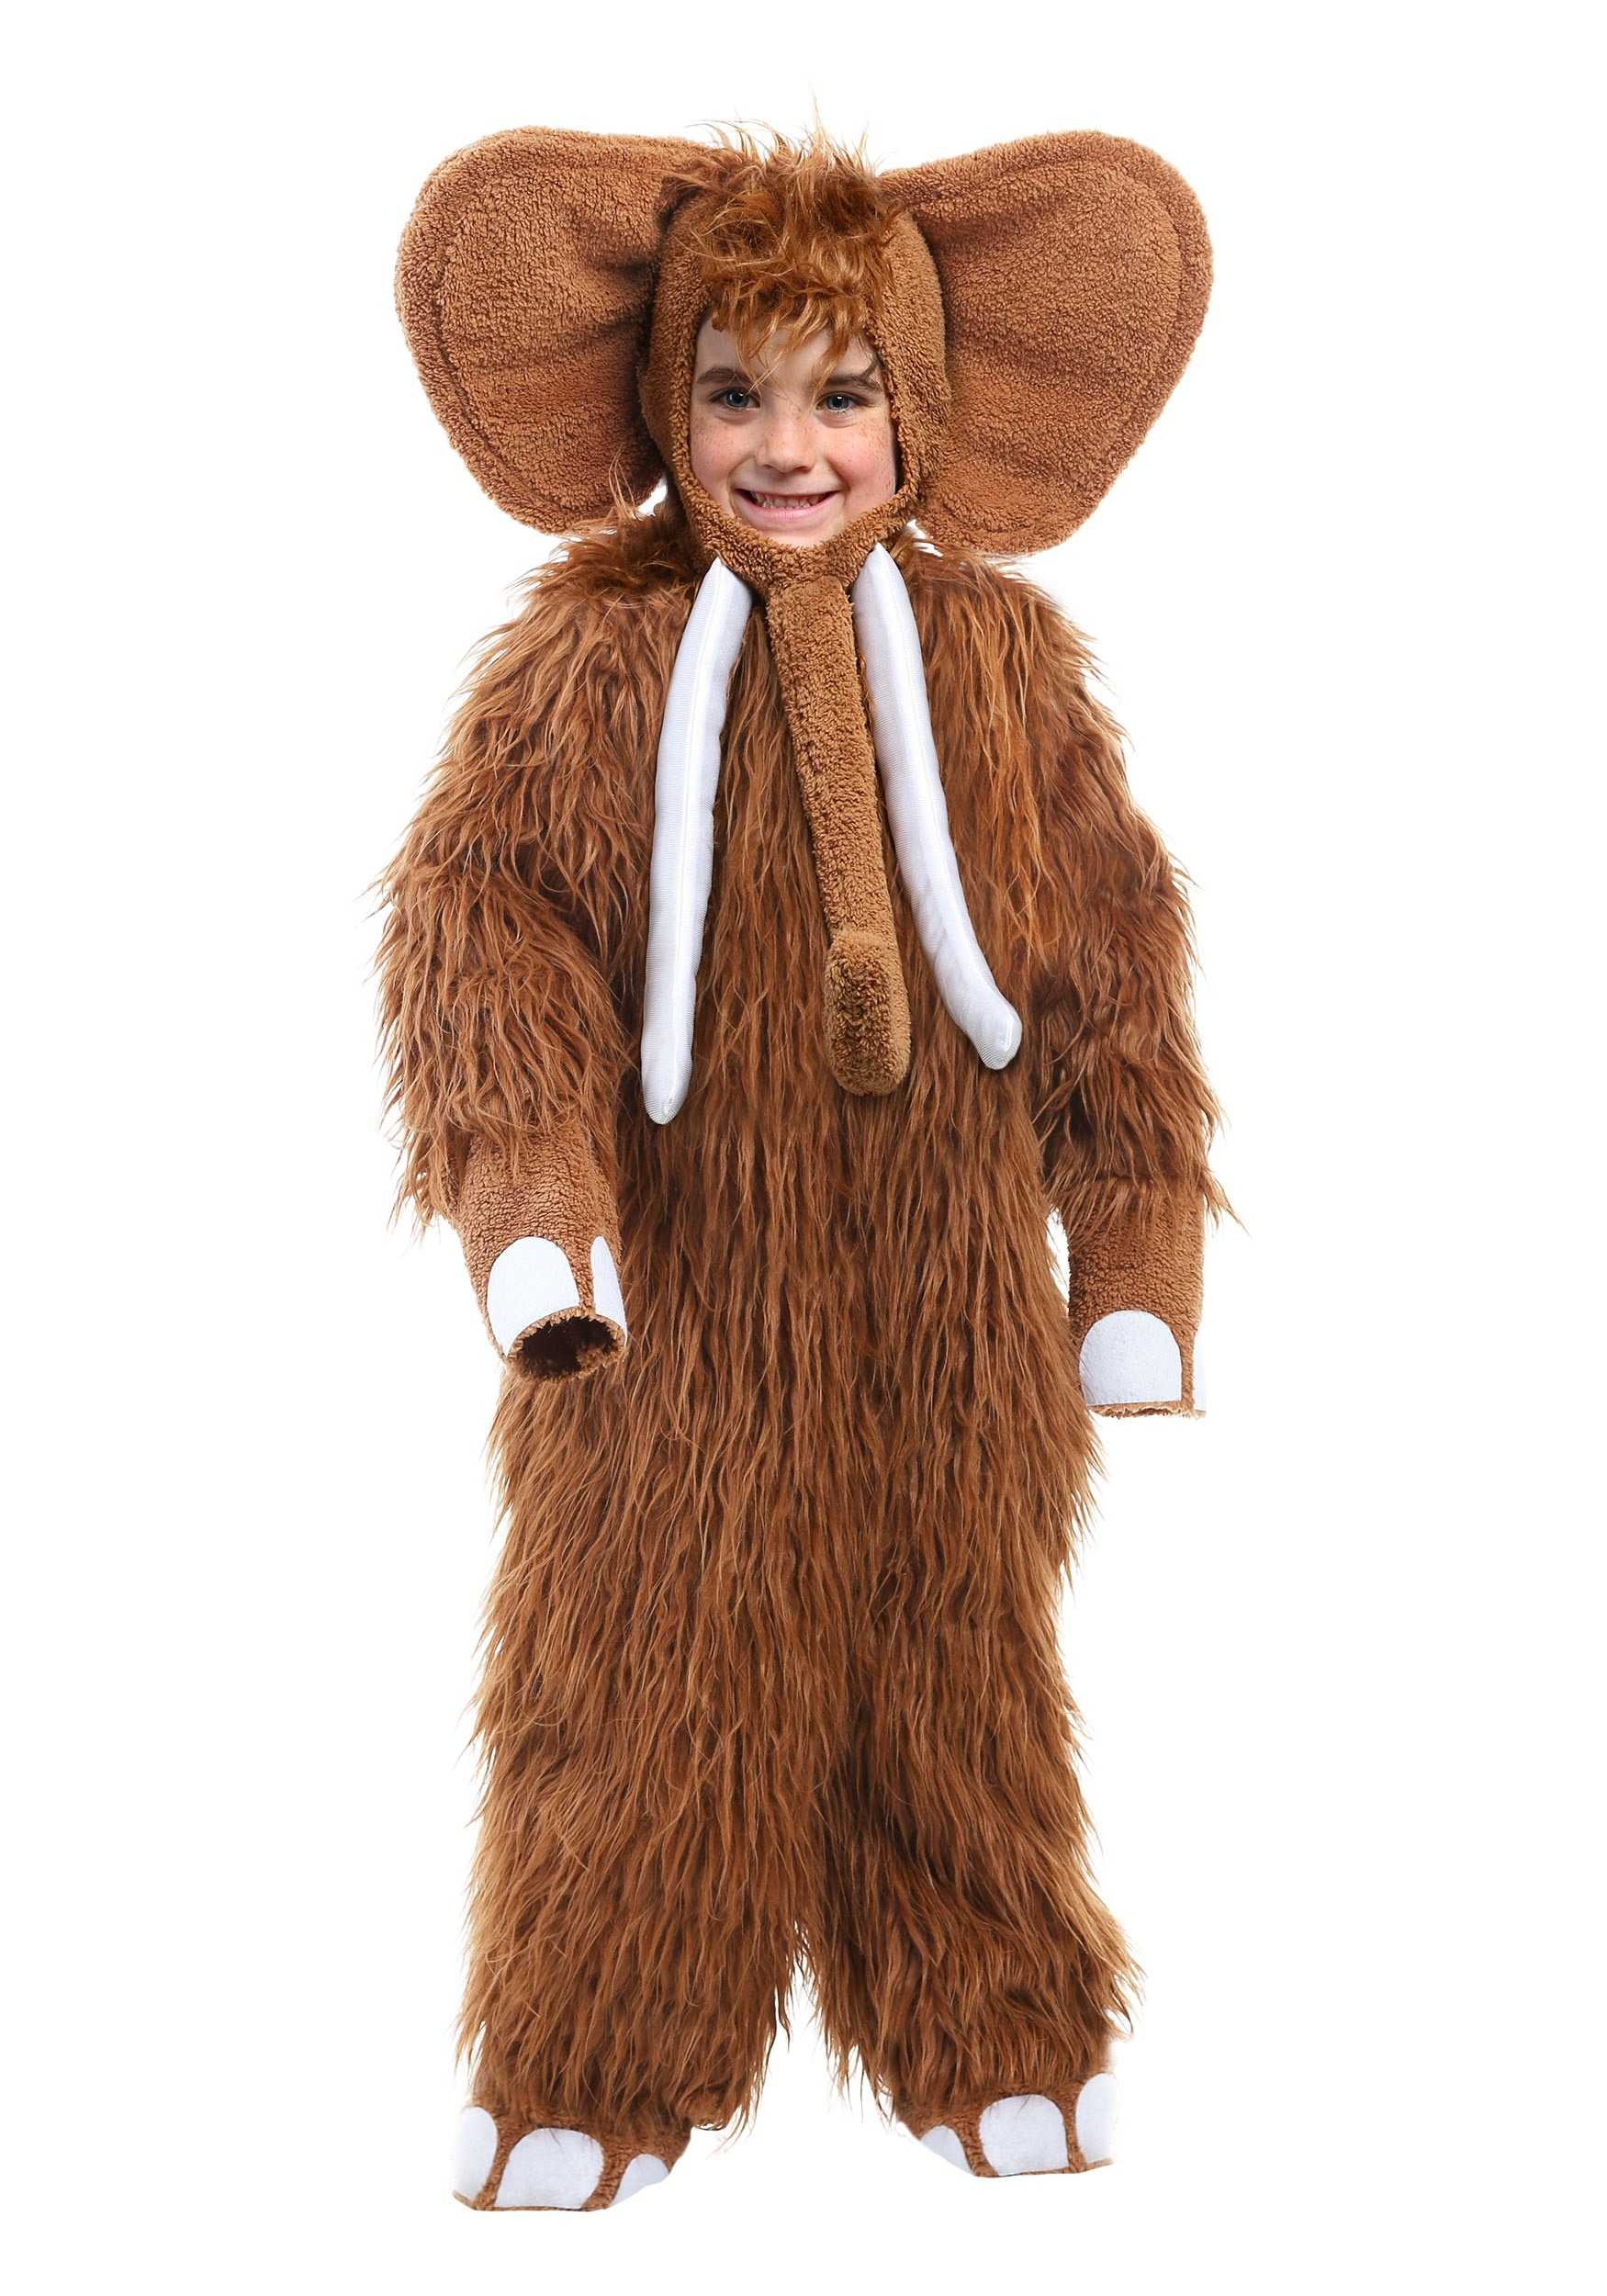 Woolly Mammoth Boys Costume